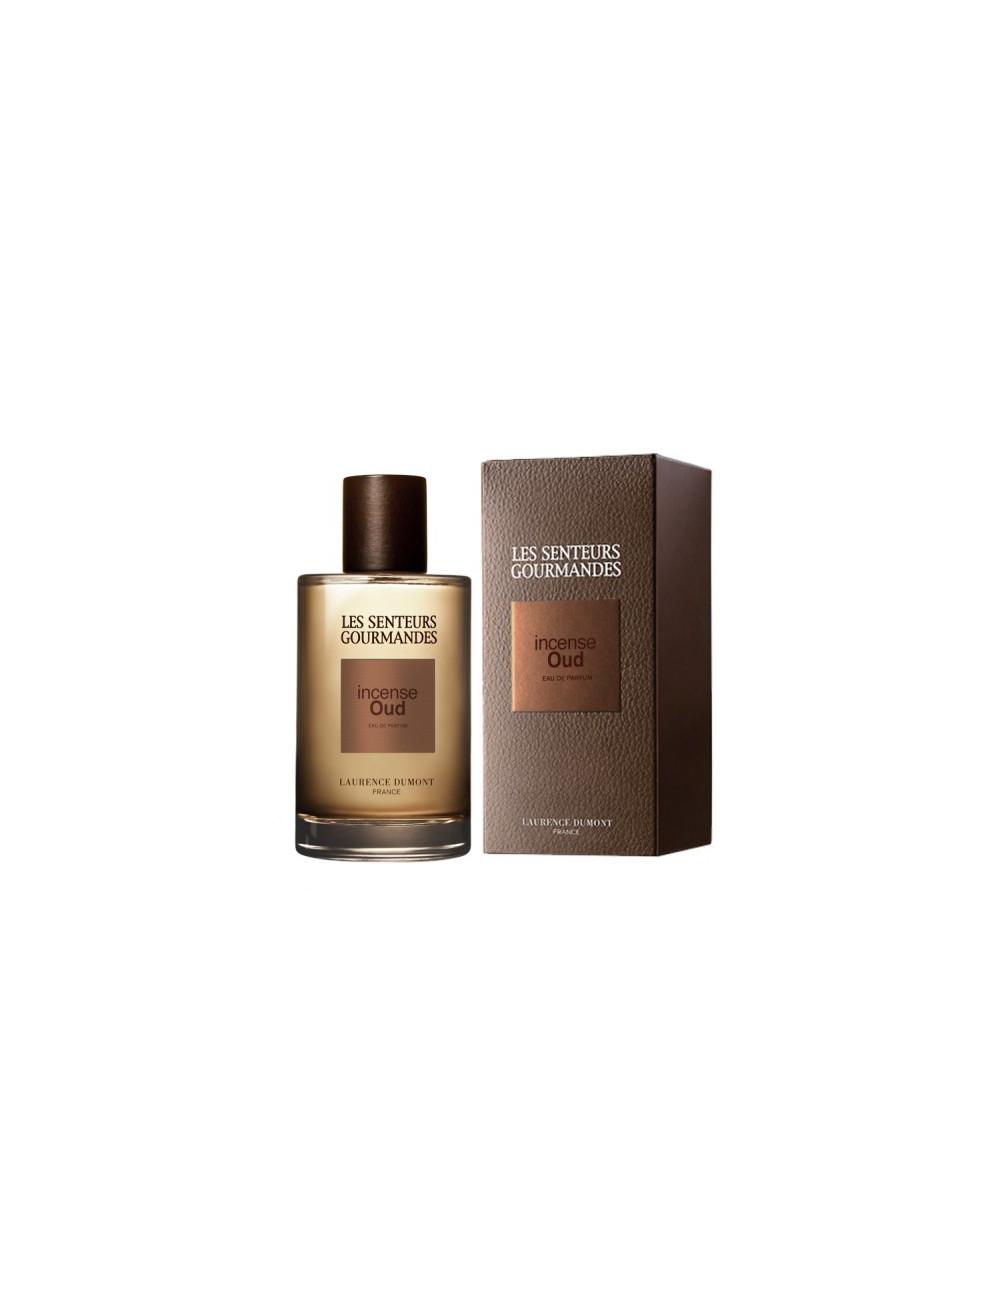 LES SENTEURS GOURMANDES - PRUNE JASMIN 100 ml